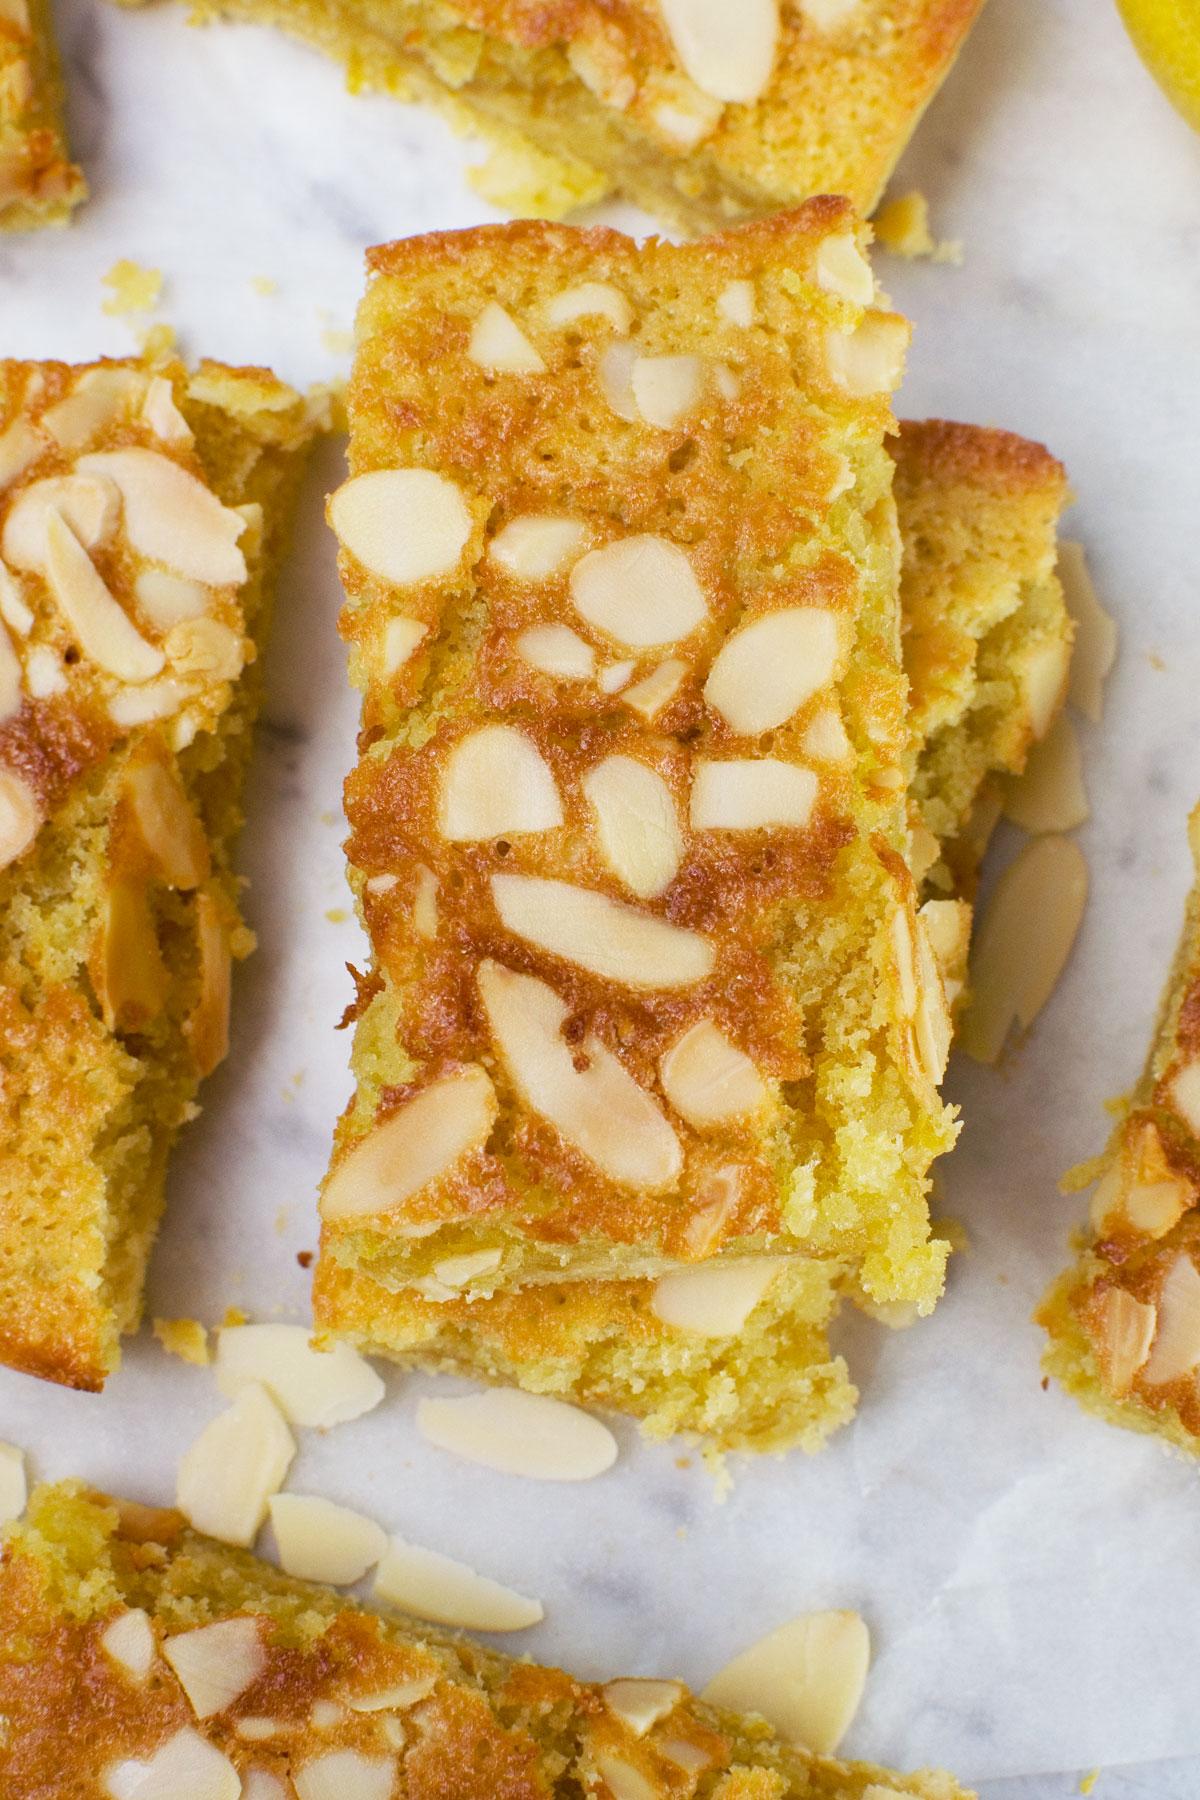 Lemon bakewell slices from above